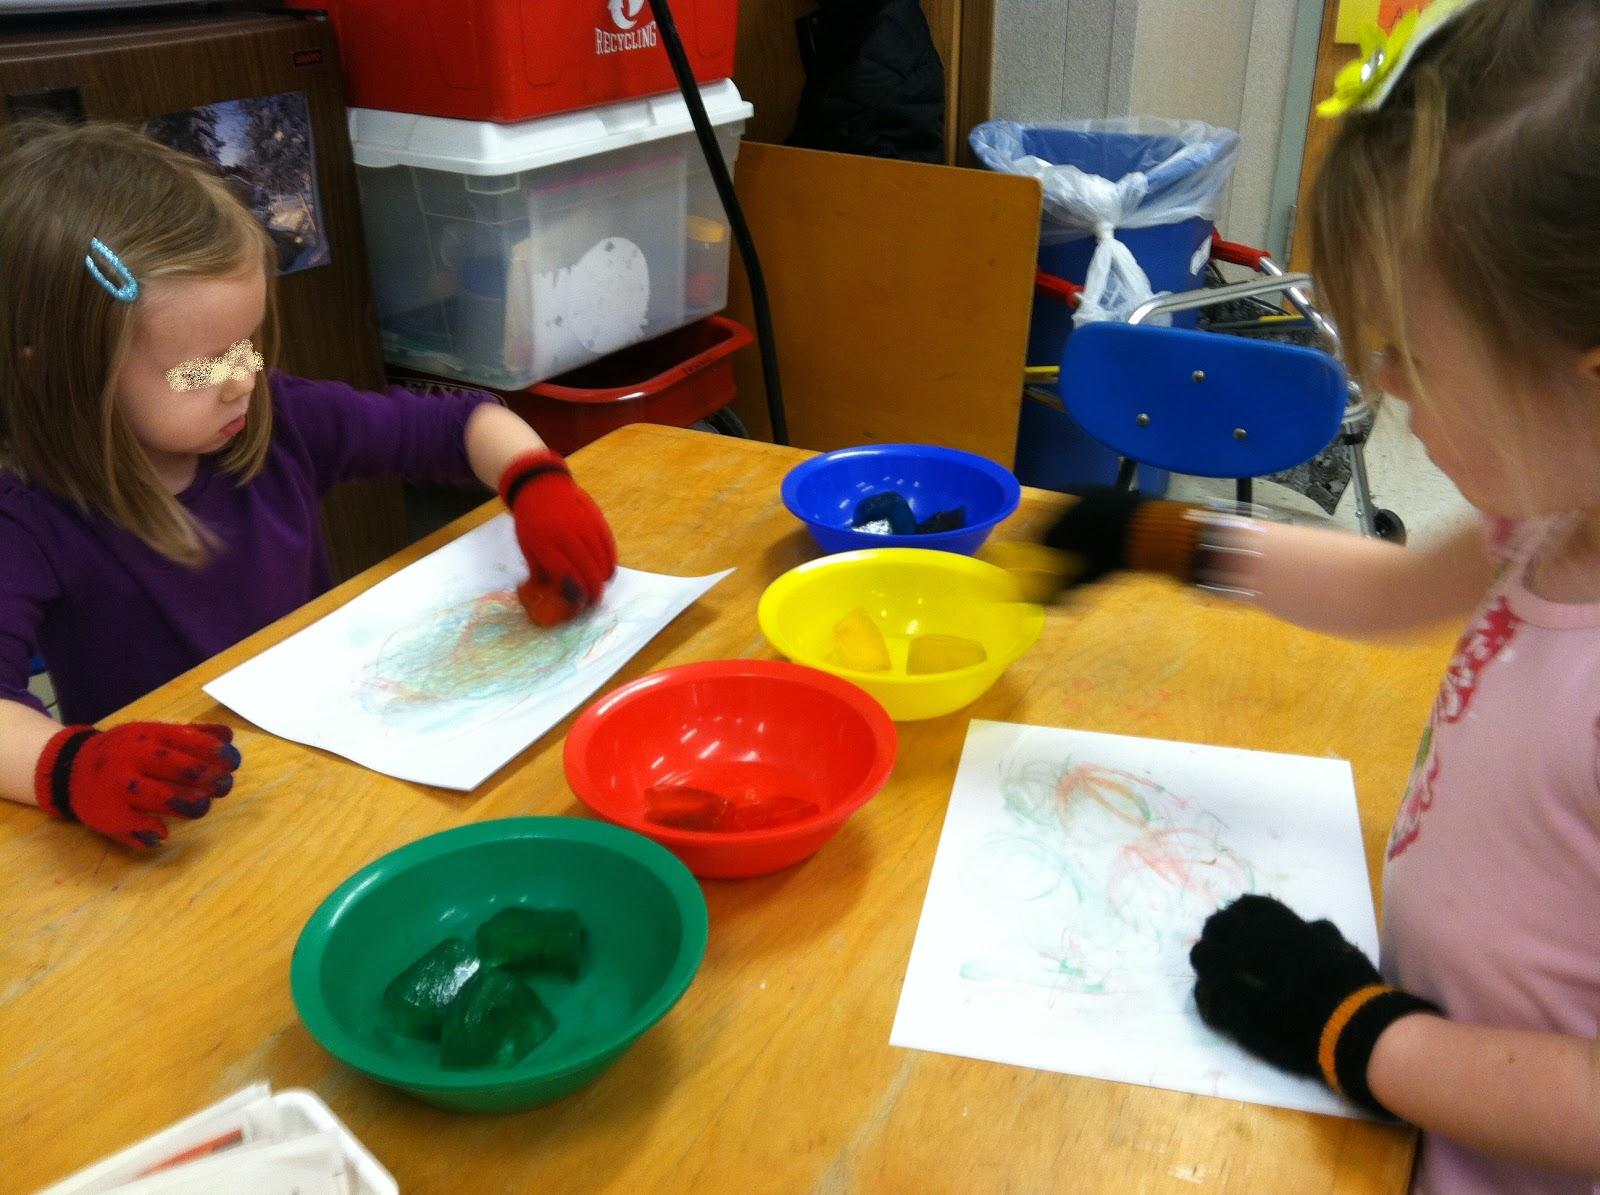 Jen S Ot For Kids Ice Cube Painting